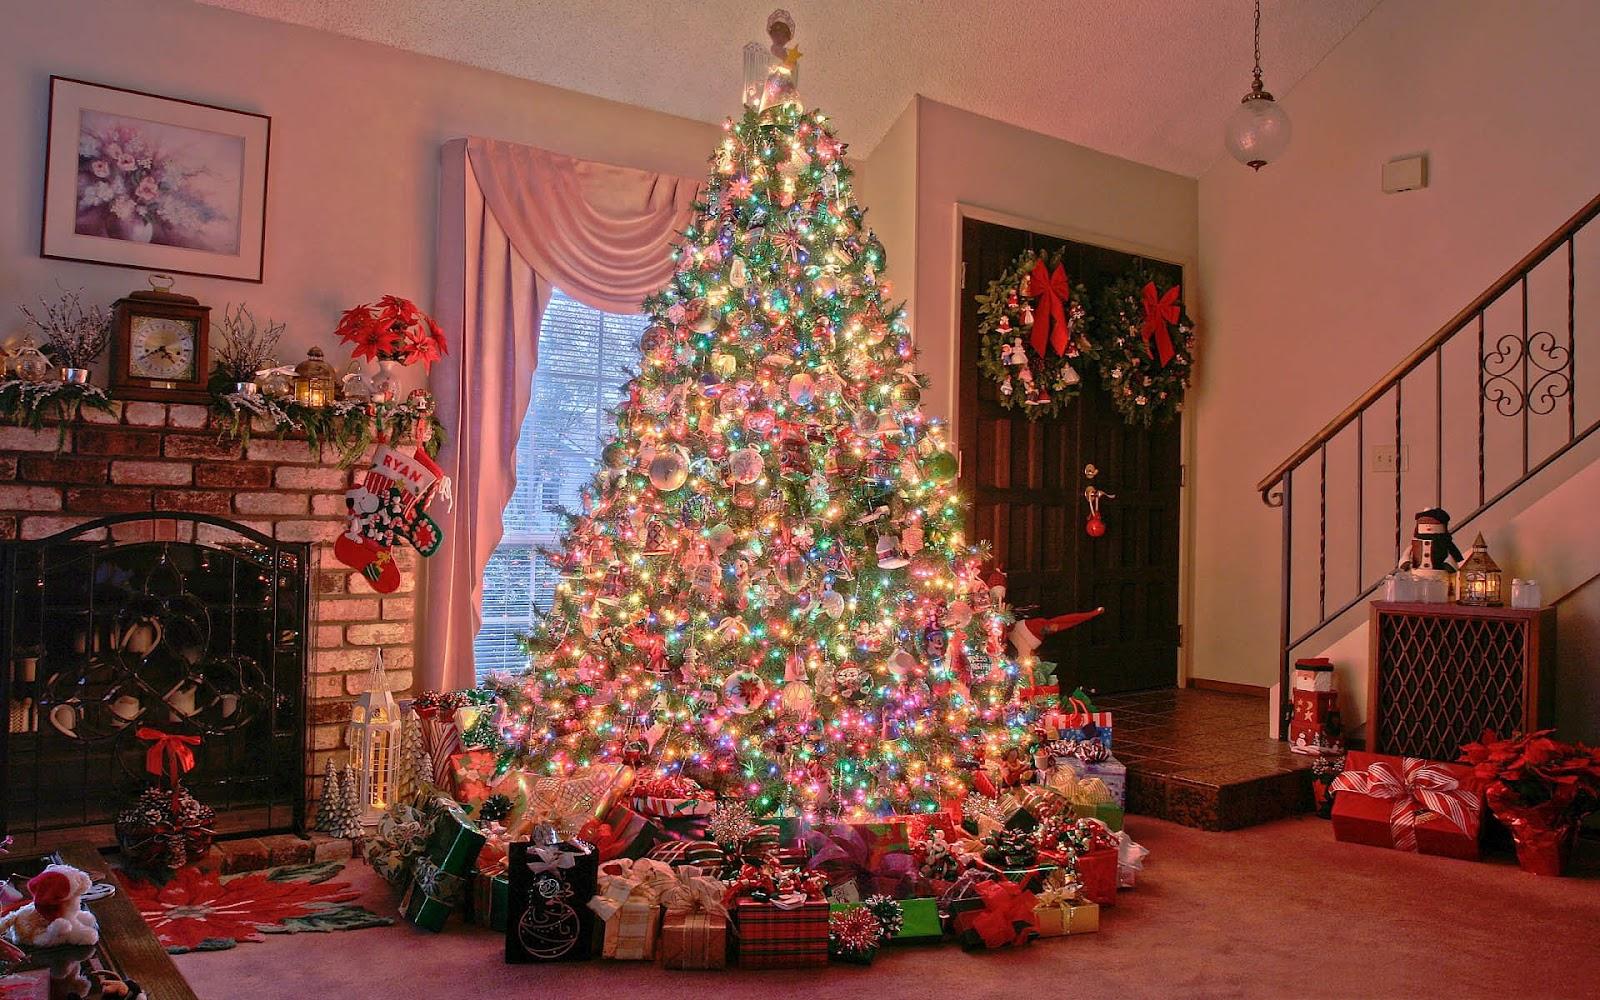 Prachtige kerstboom in woonkamer - Achtergronden